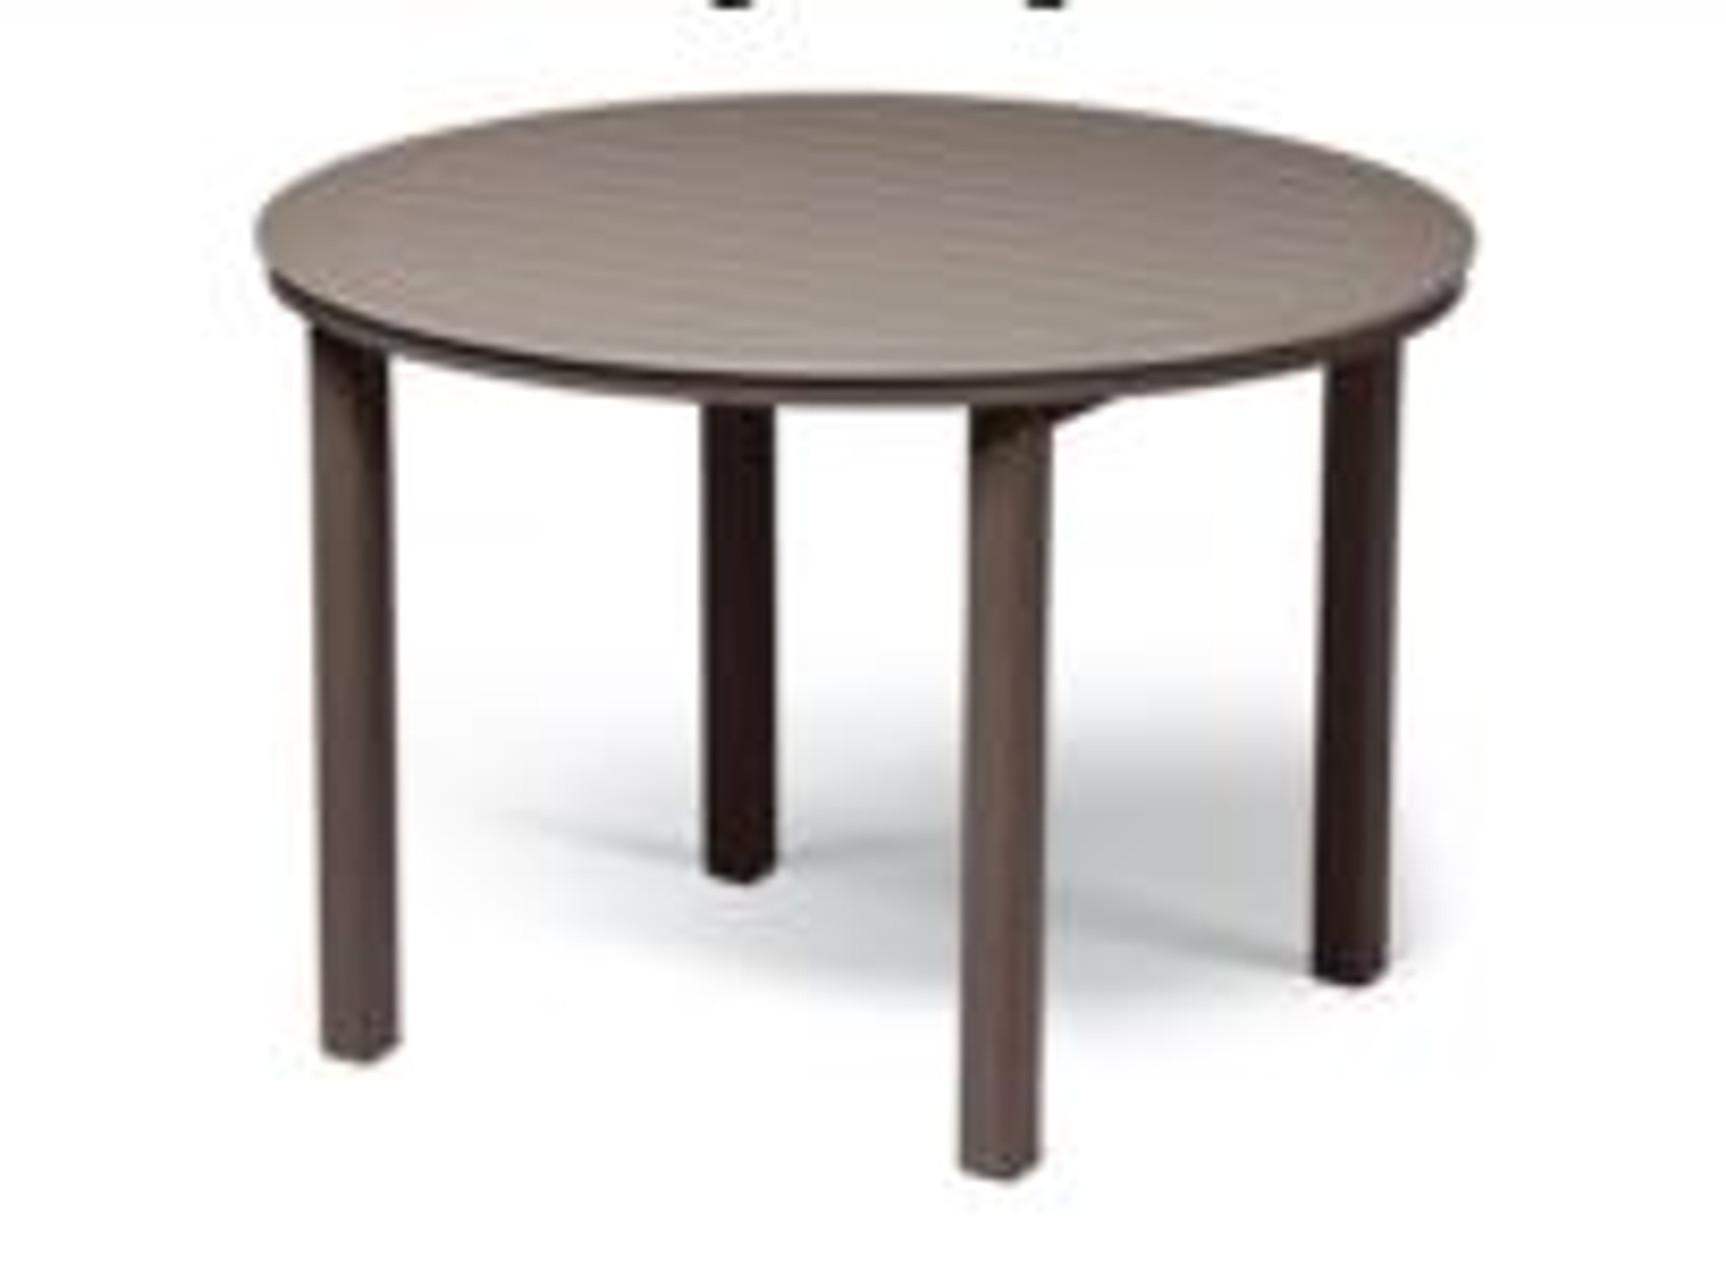 telescope marine grade polymer top table 54 round balcony height table w hole